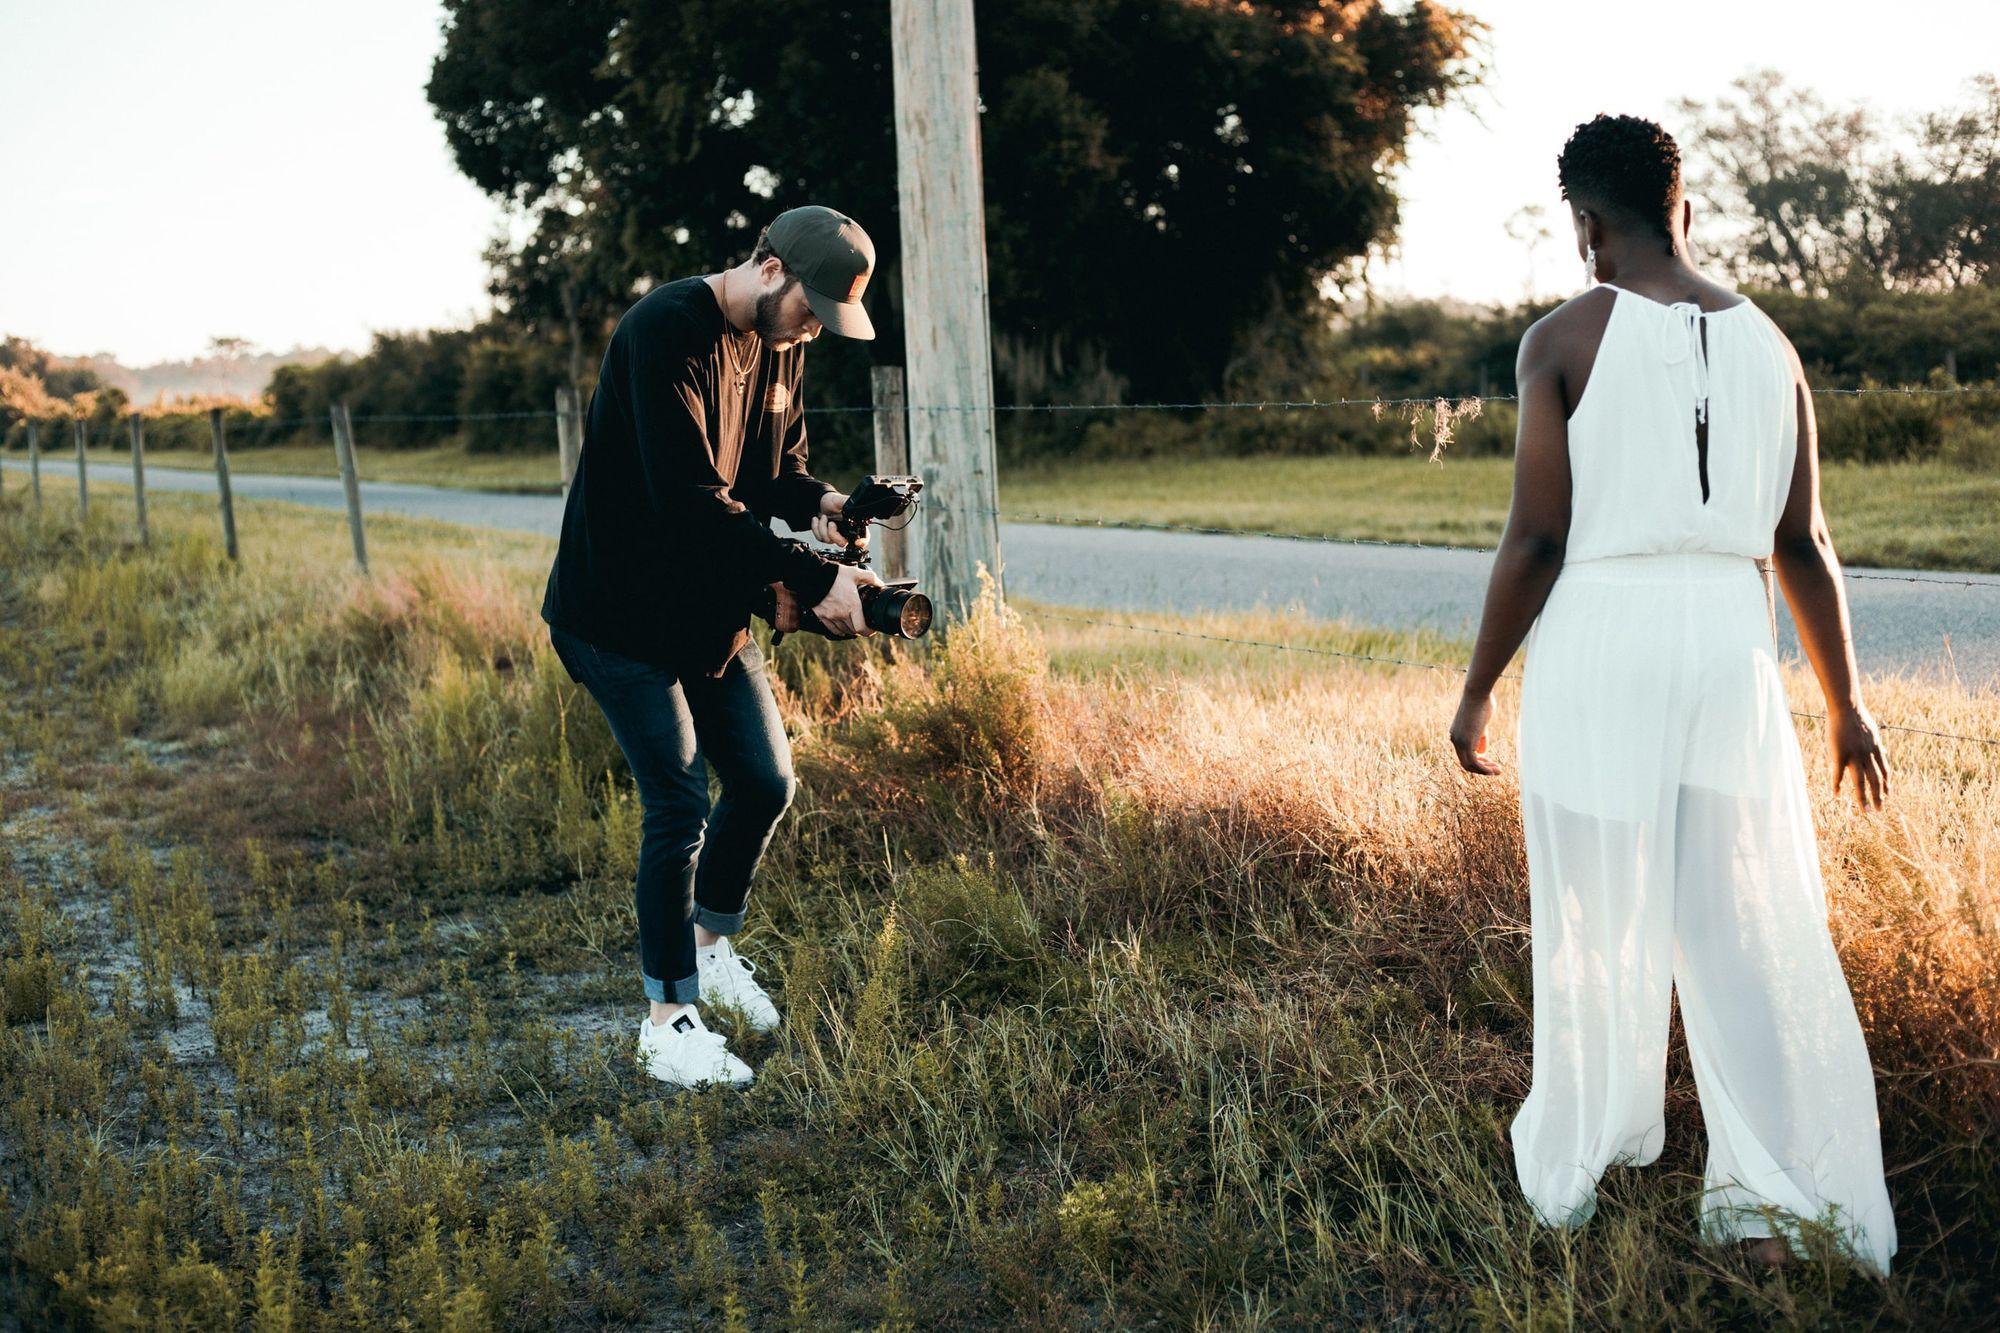 fashion-videographer-filming-woman-in-white-dress